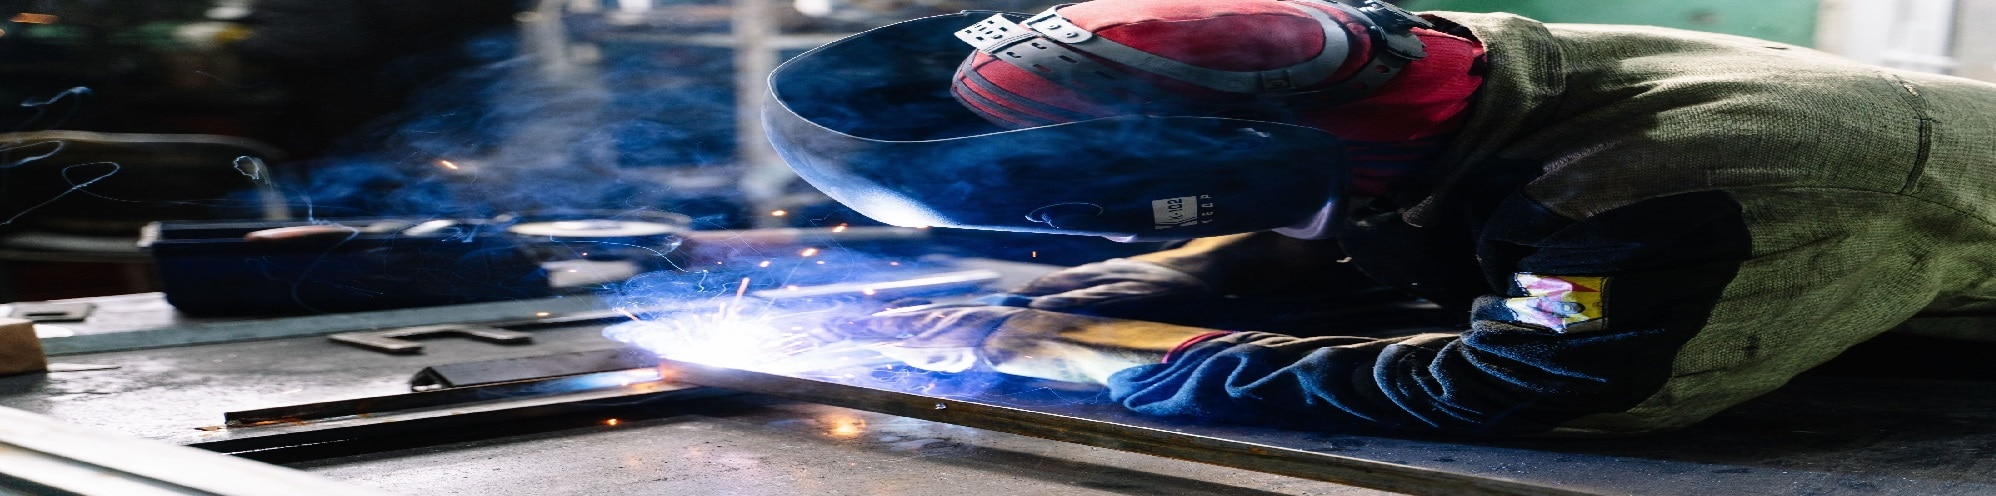 Iron Works Repair - Big Easy Iron Works